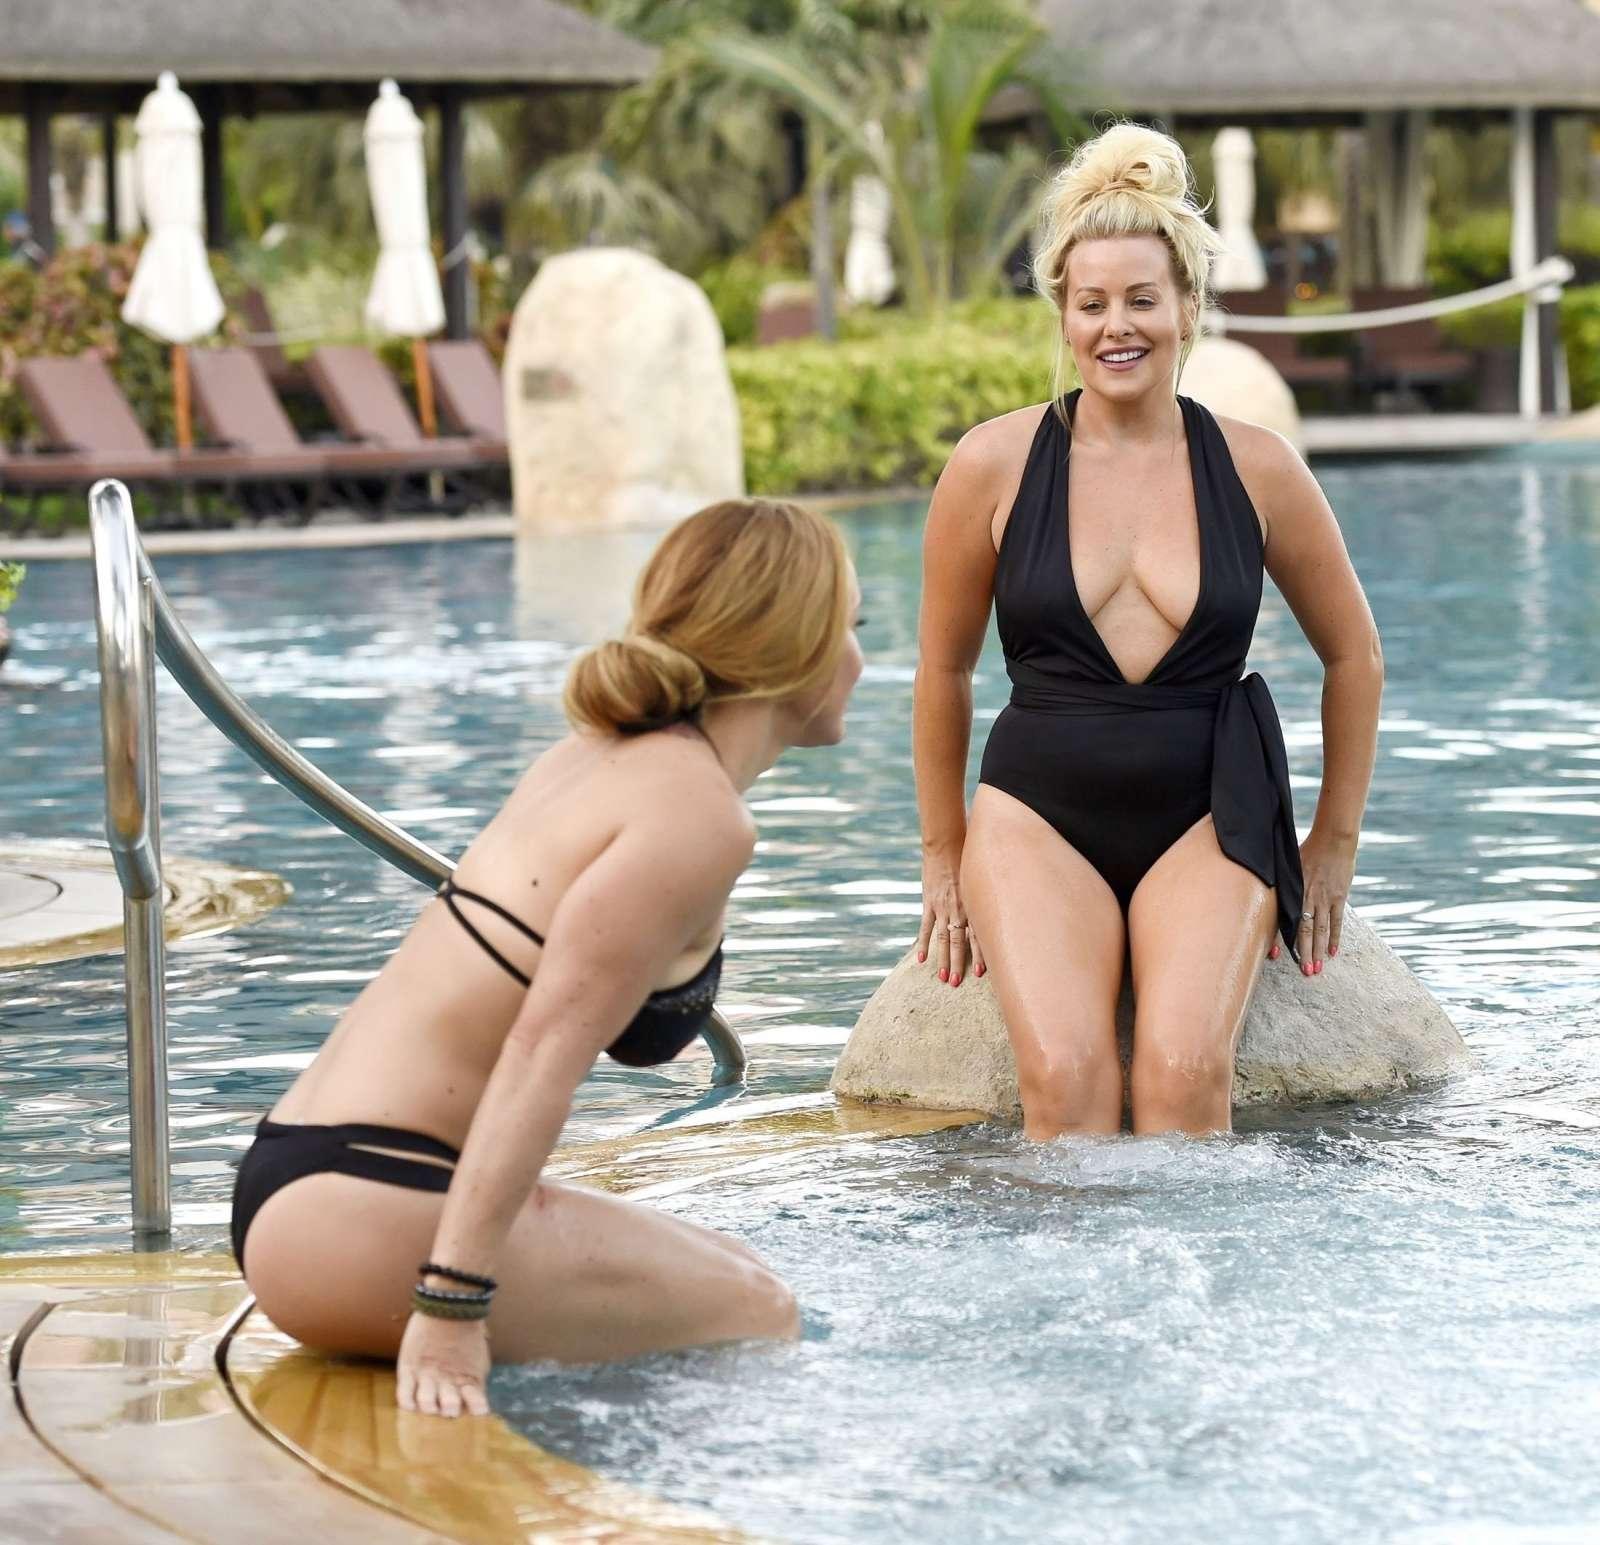 TheFappening Selina Waterman-Smith naked (84 photo), Topless, Bikini, Selfie, braless 2006